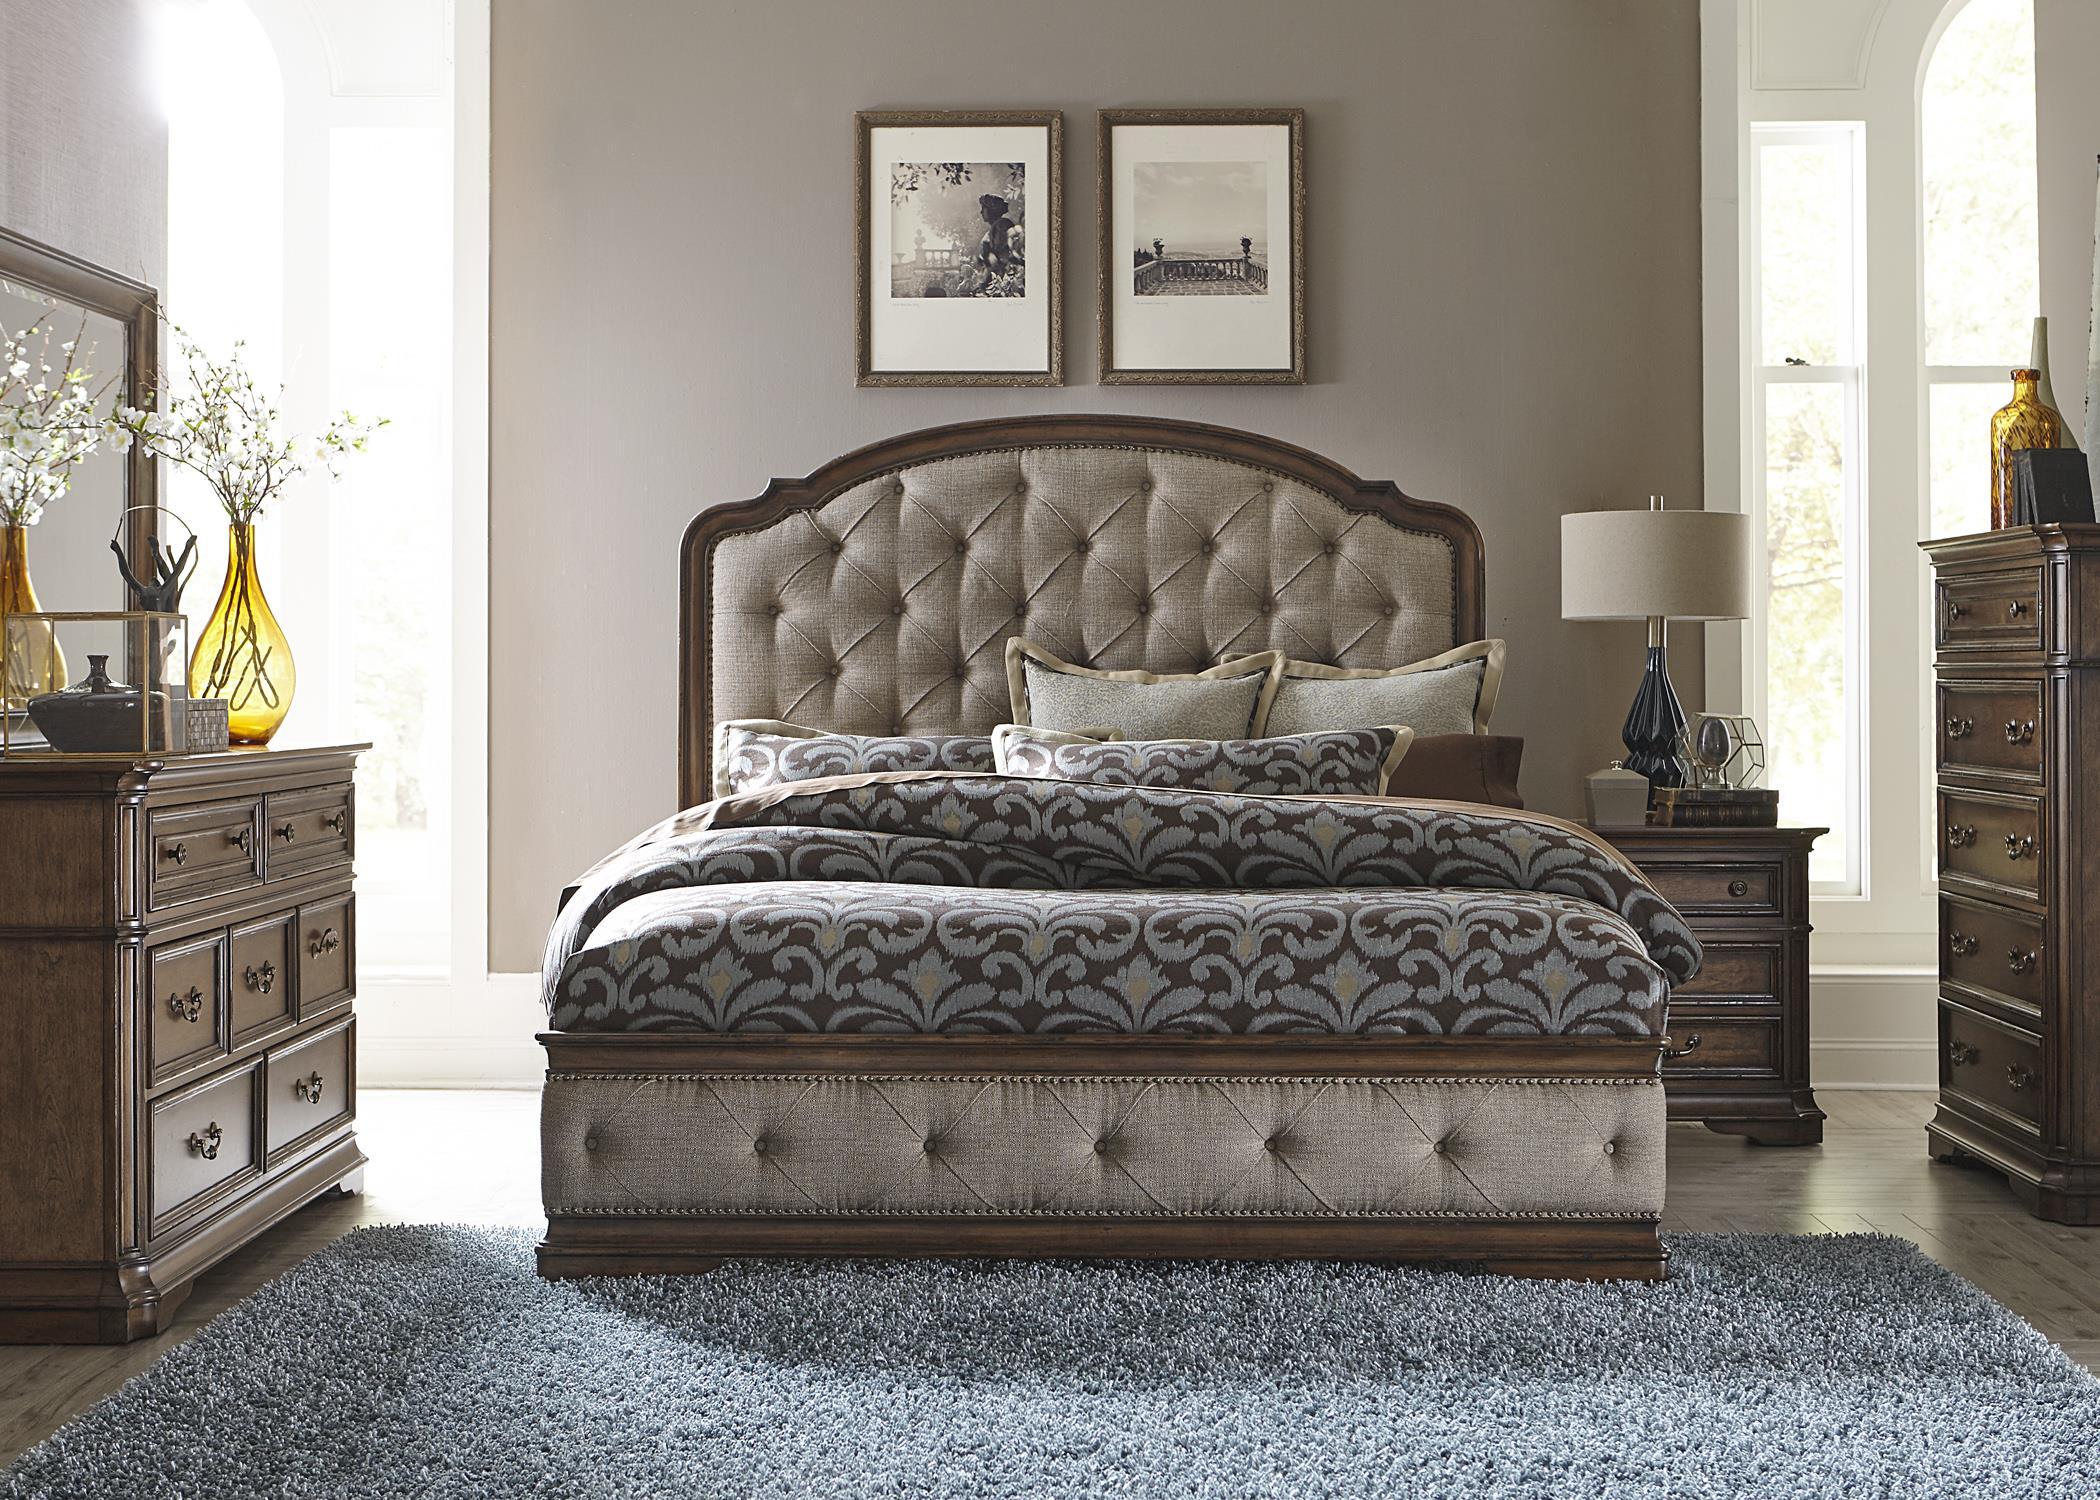 Liberty Furniture Amelia Queen Bedroom Group Royal Furniture Bedroom Groups